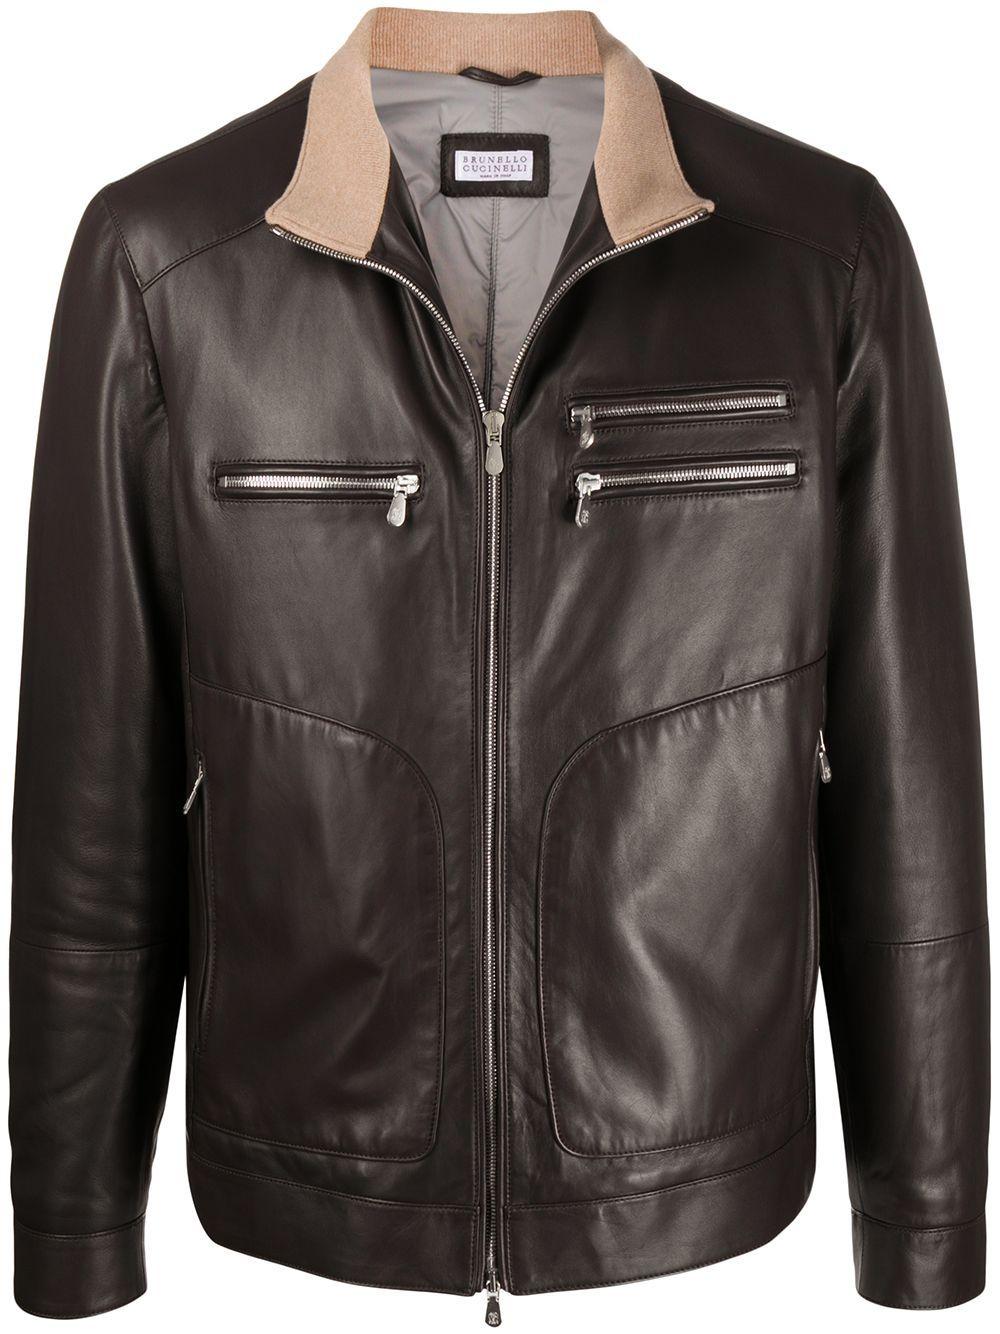 Brunello Cucinelli Padded Leather Jacket Farfetch Leather Jacket Jackets Brown Leather Jacket [ 1334 x 1000 Pixel ]